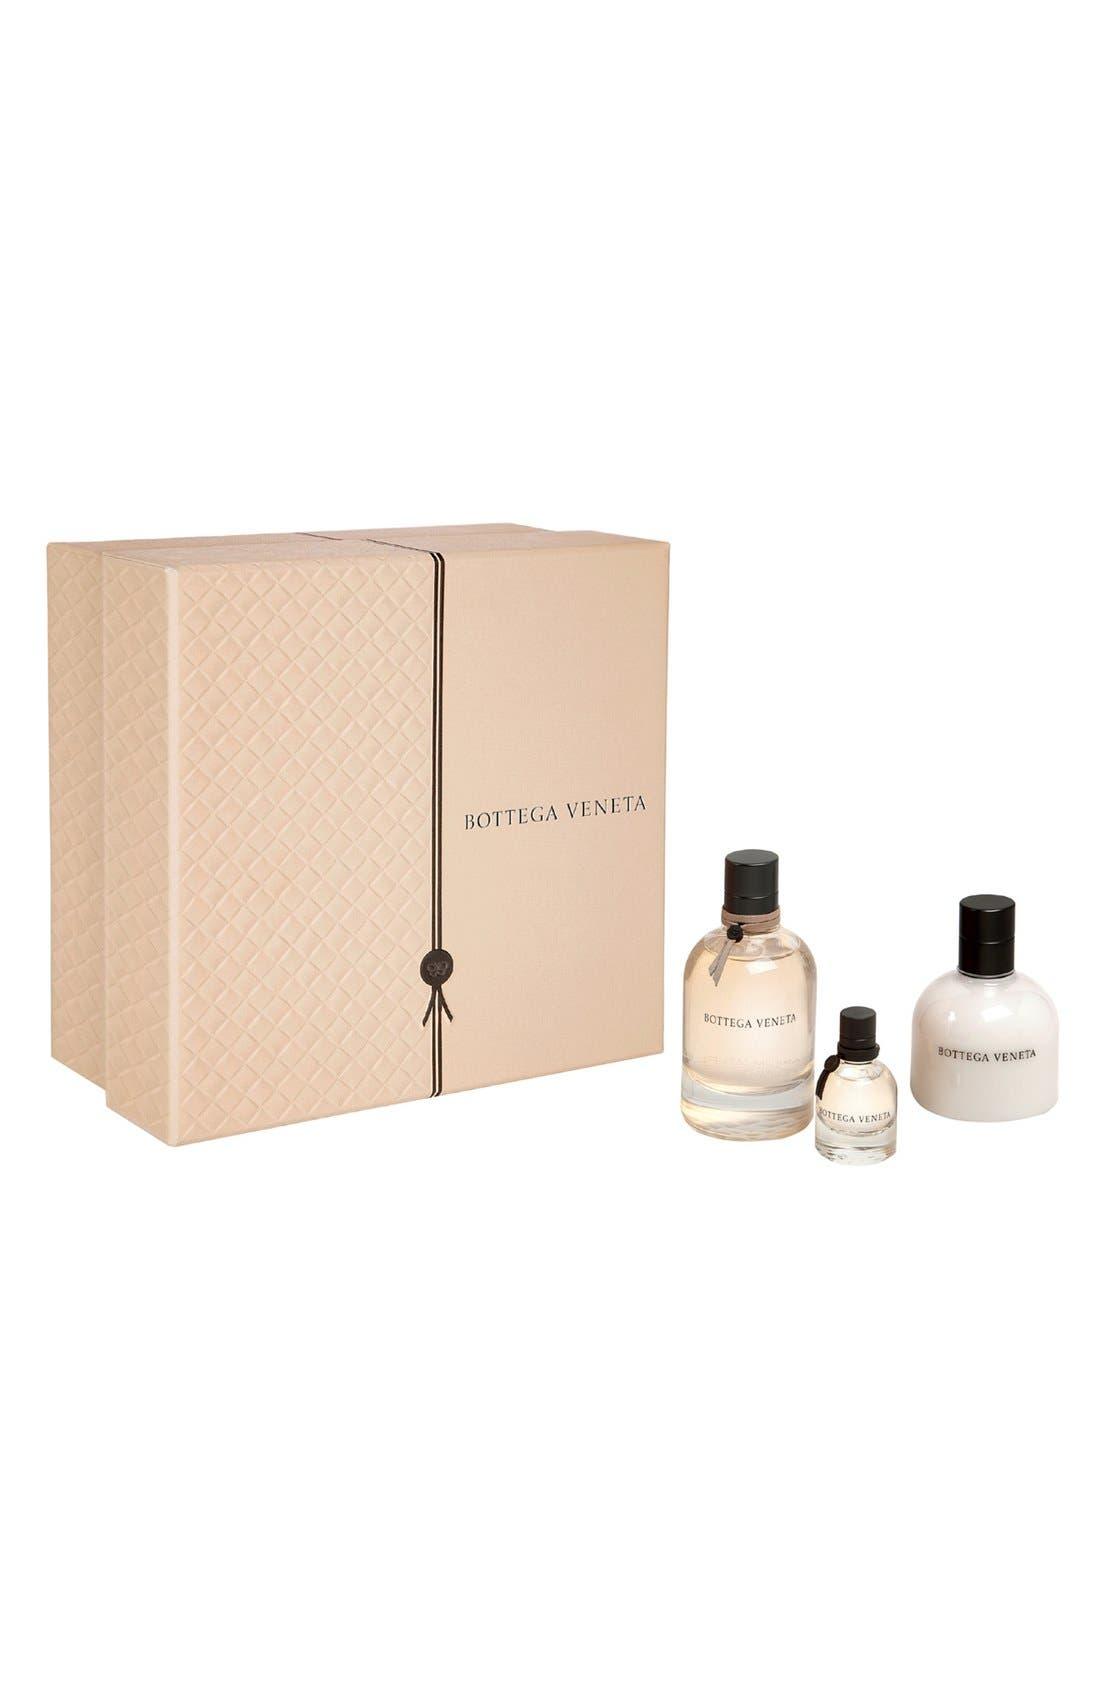 BOTTEGA VENETA,                             Fragrance Gift Set,                             Main thumbnail 1, color,                             000